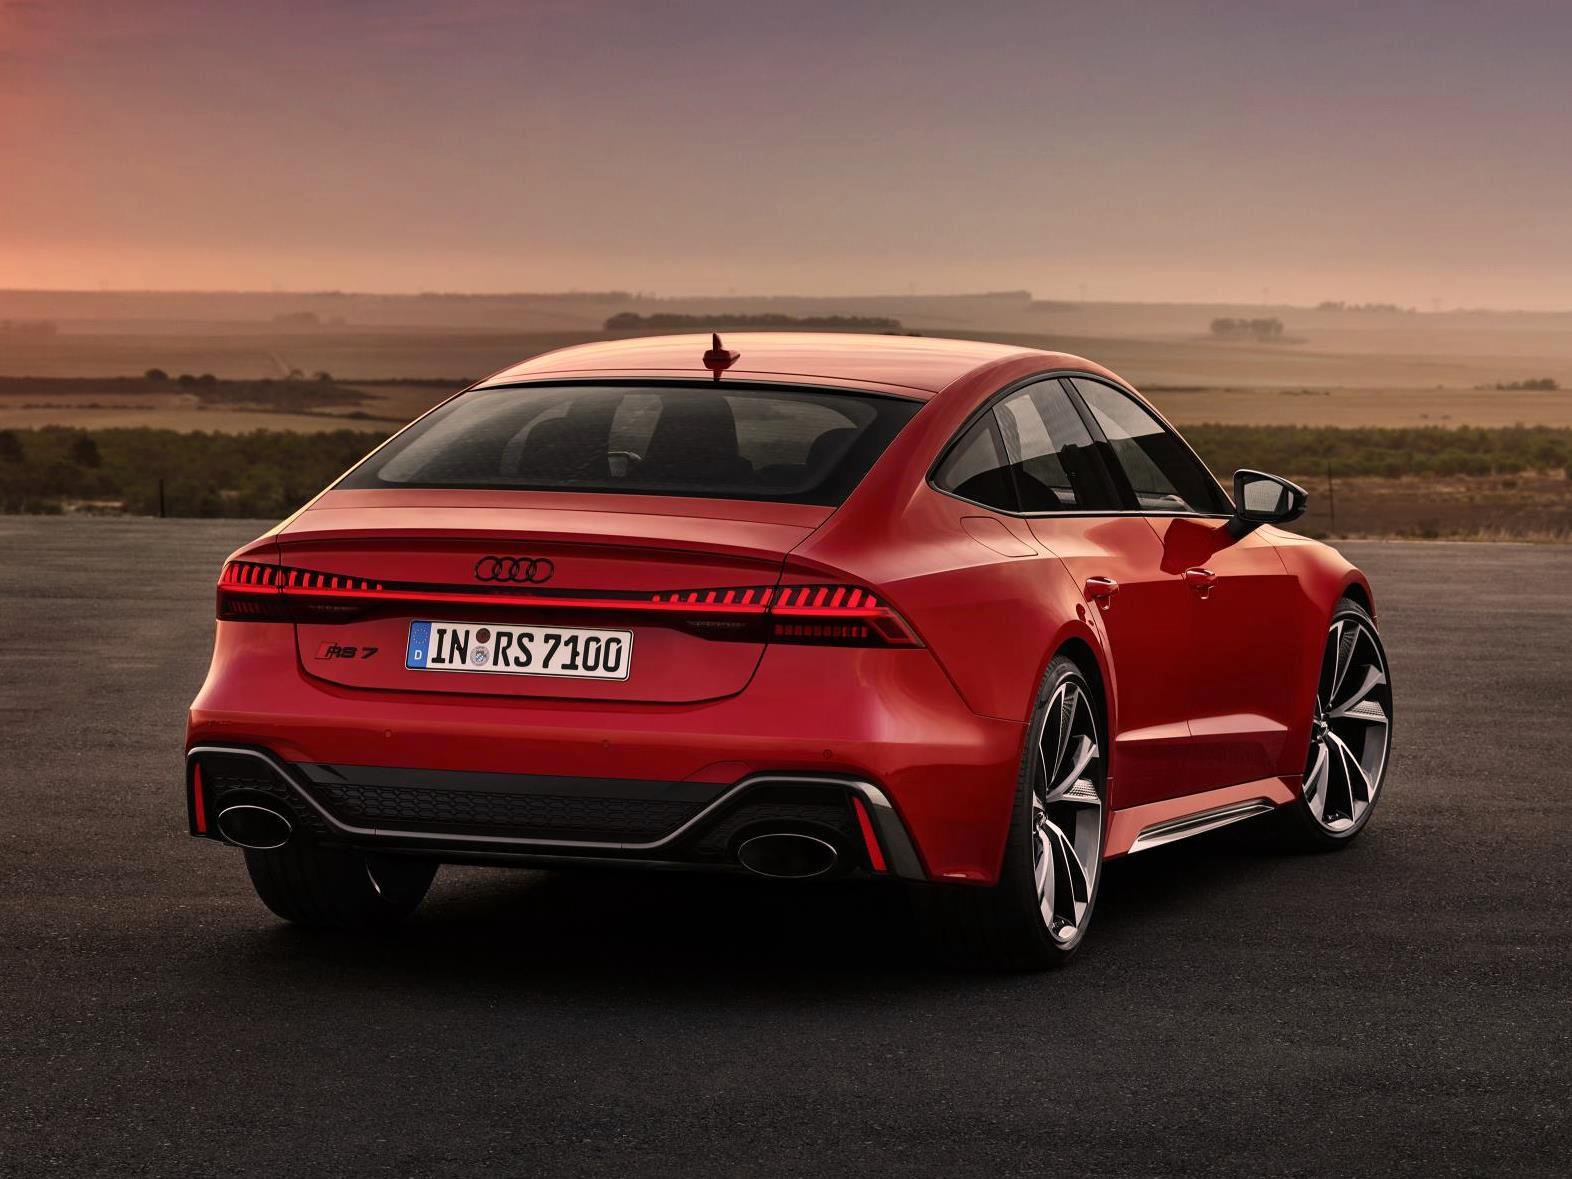 2020 Audi RS 7 Sportback